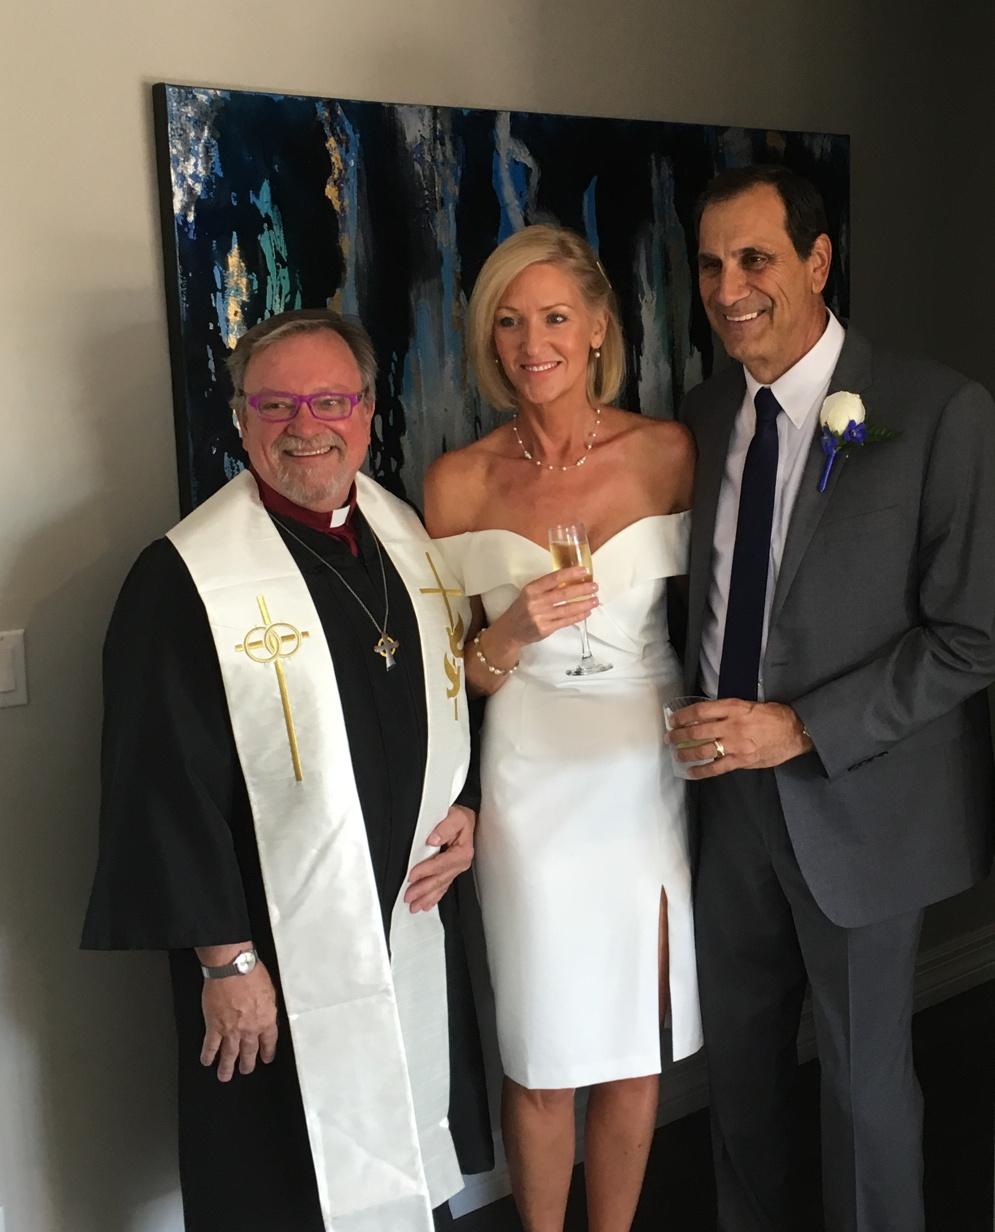 Rich Karen wedding